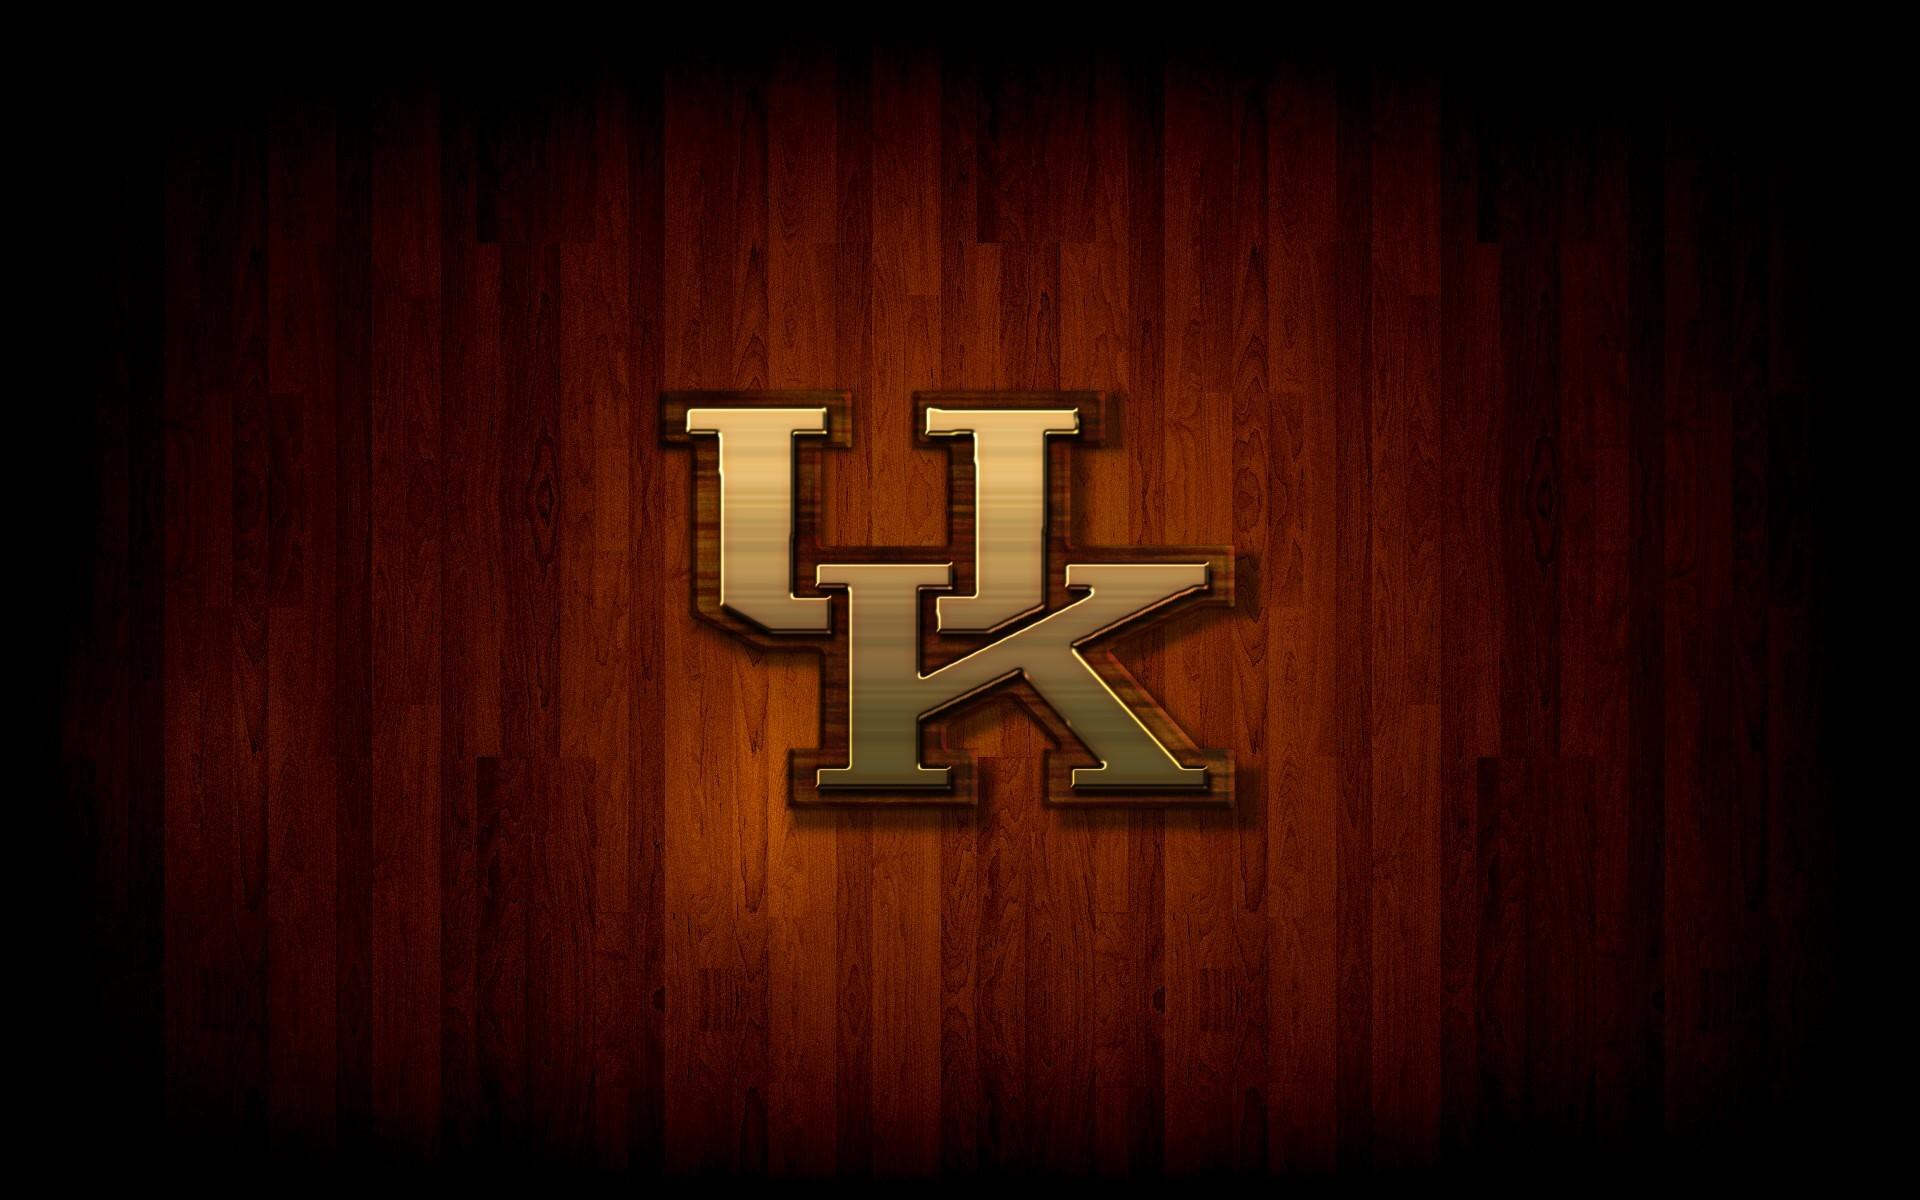 Kentucky Wildcats Wallpapers Download Free   HD Wallpapers   Pinterest    Kentucky basketball and Wallpaper